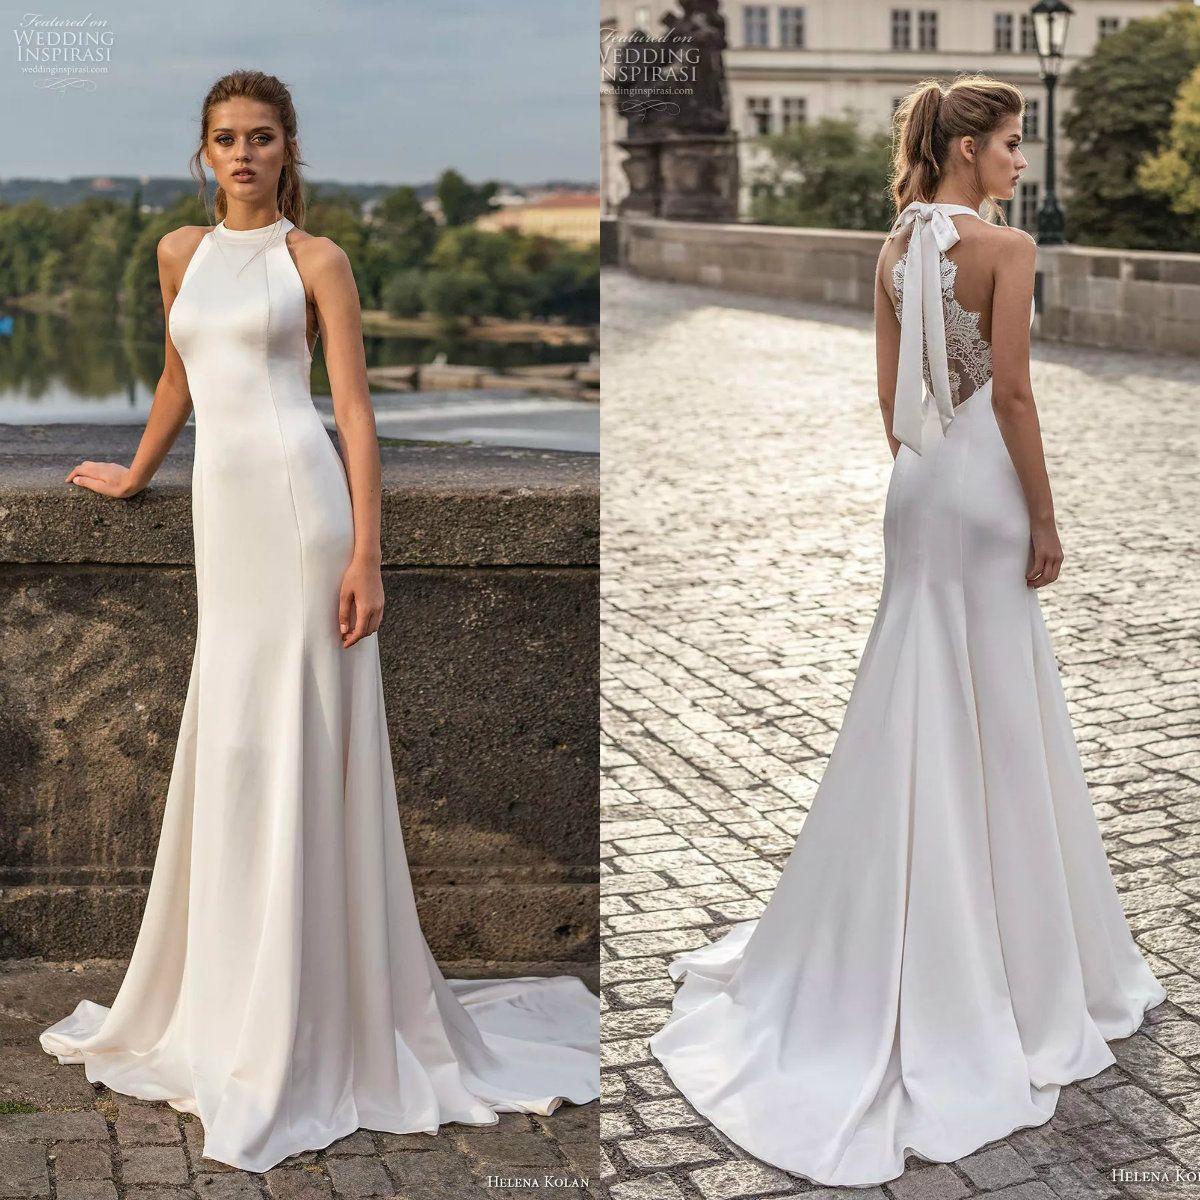 elegant halter neck wedding dresses mermaid satin lace back sweep train  bridal gowns wedding dress custom made princess wedding dress silver  wedding